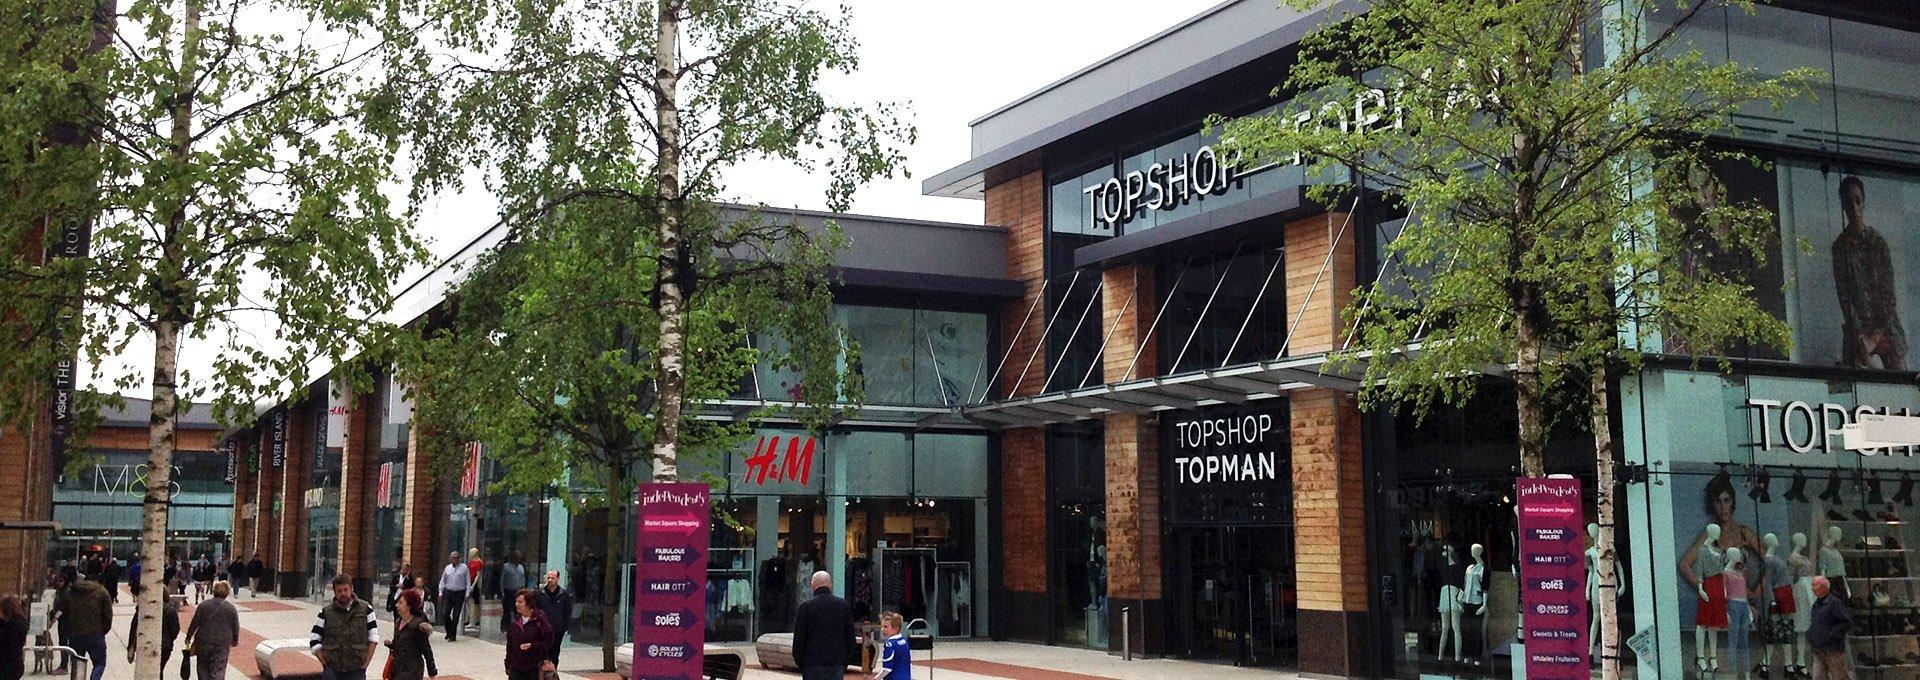 Whiteley Shopping Centre Fareham